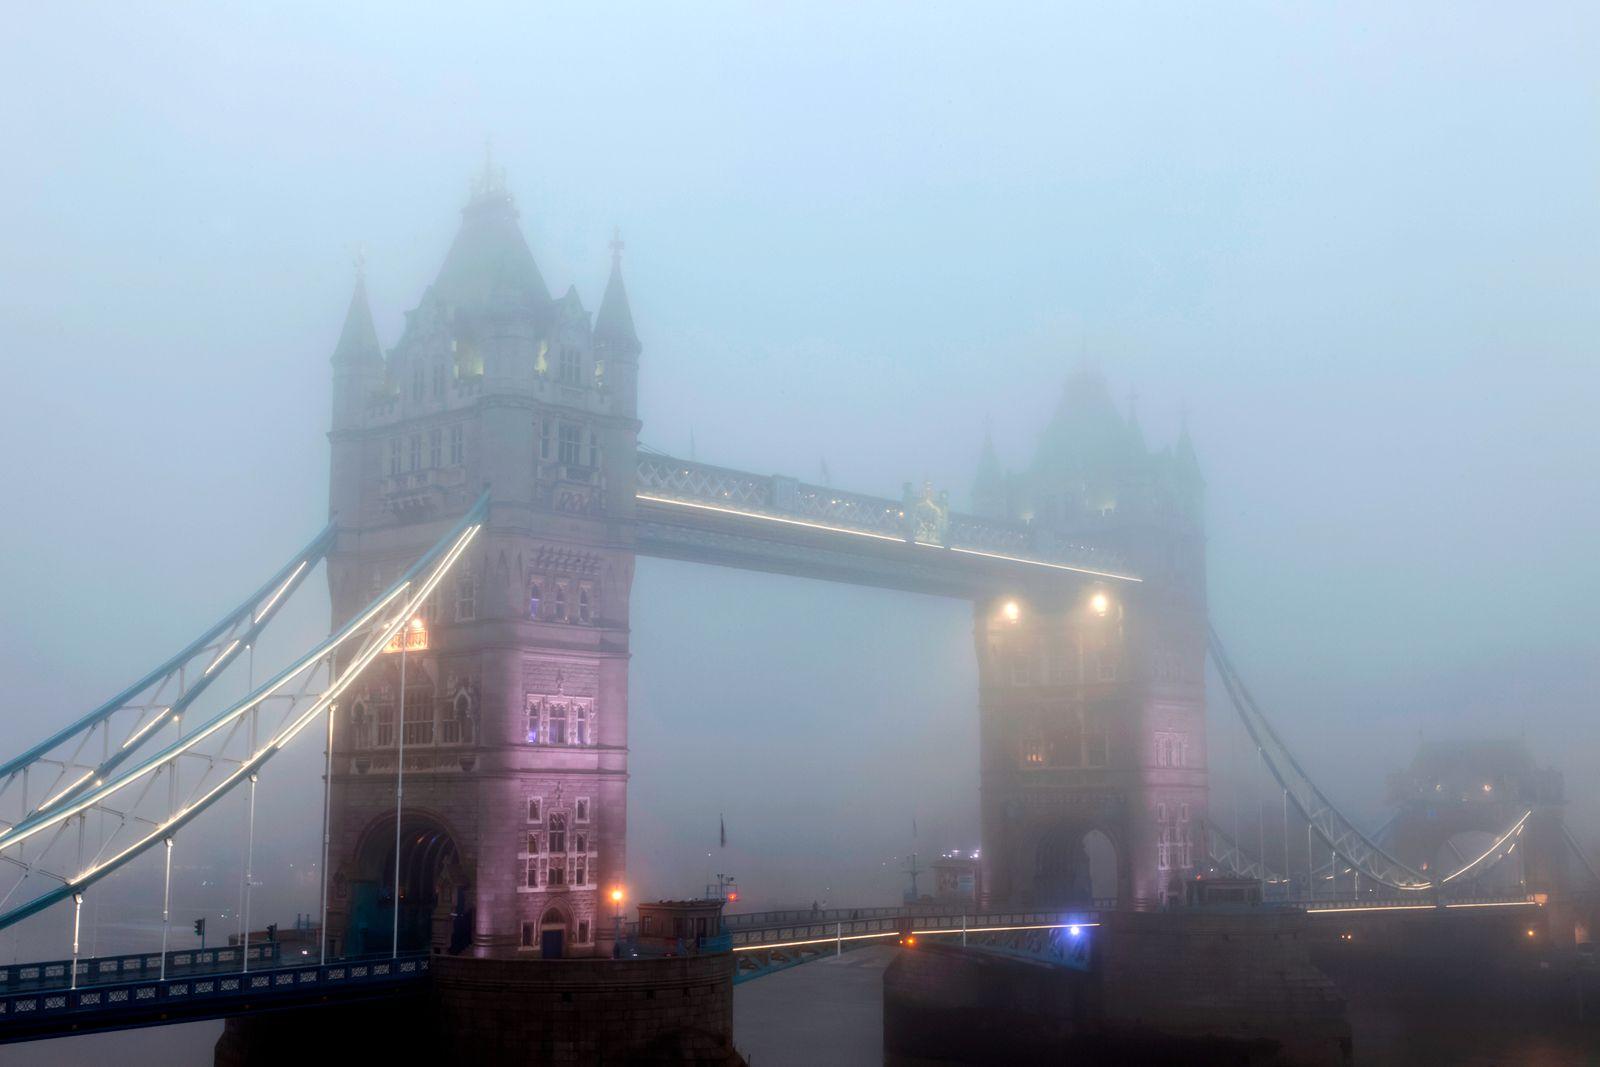 England, London, Tower Bridge in Fog